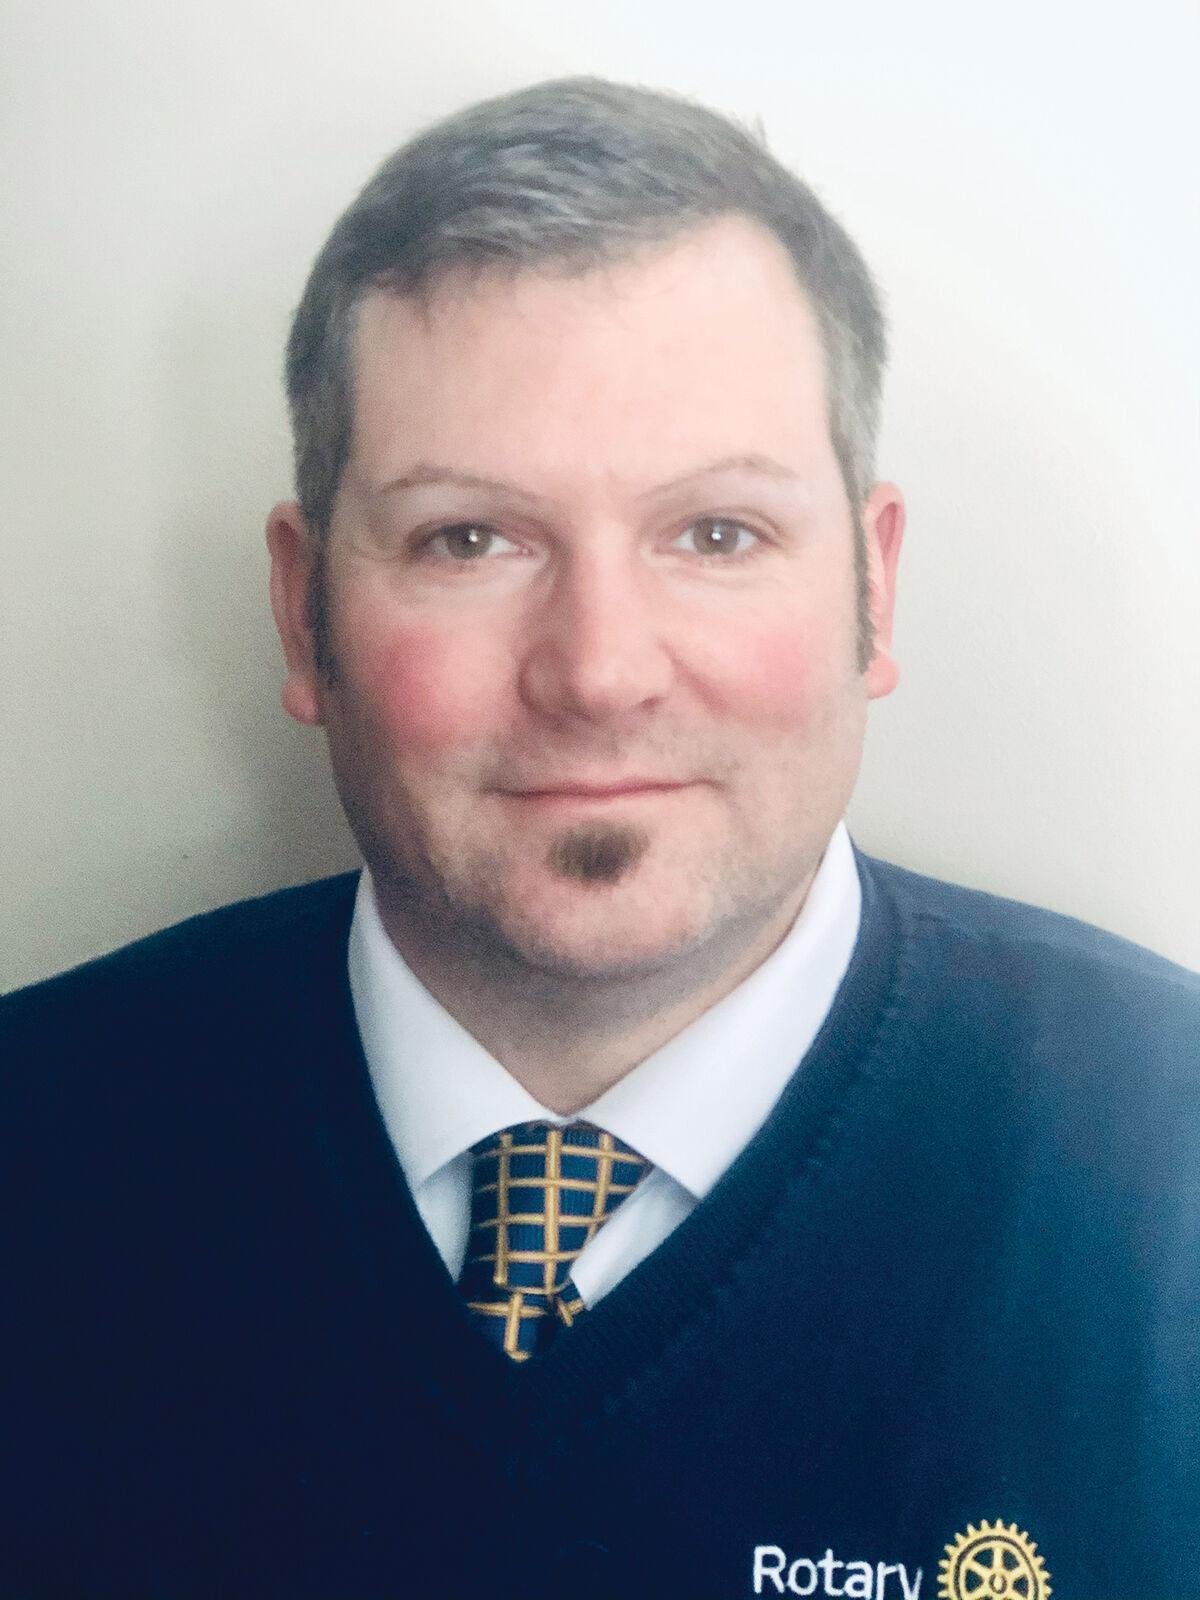 David E. McAllister